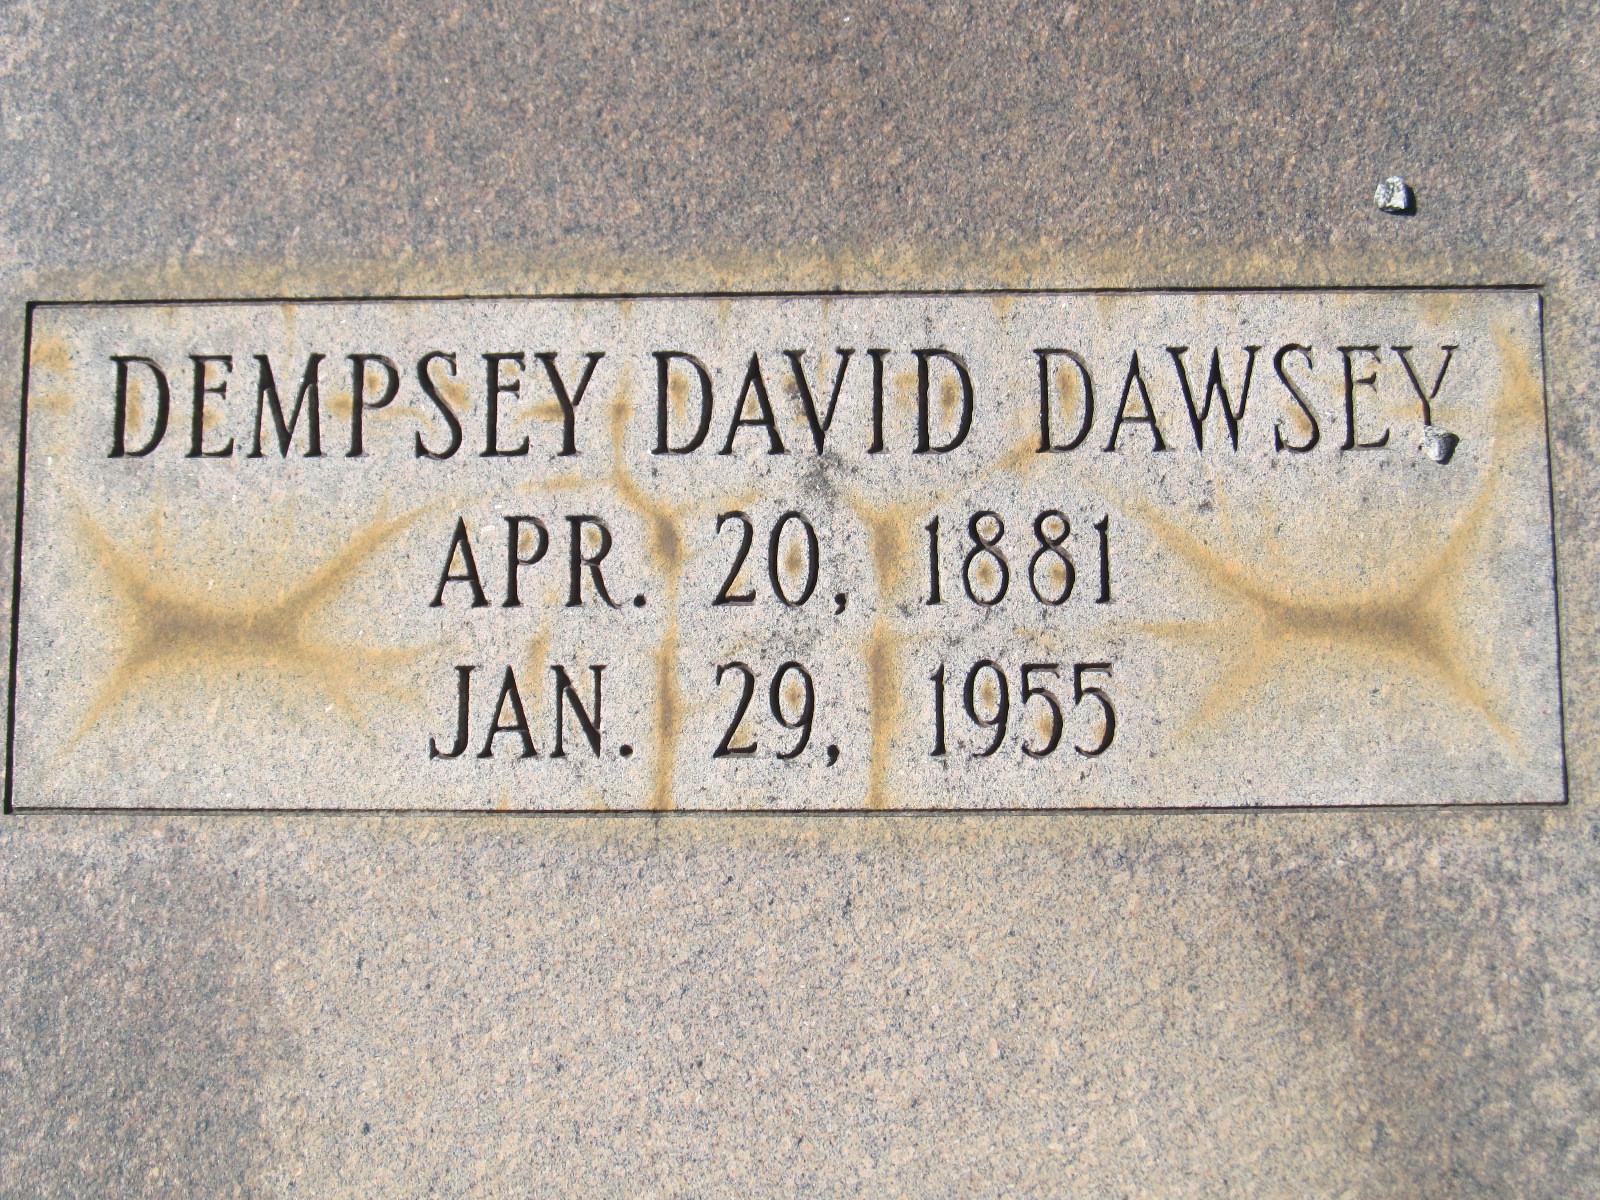 David Dawsey